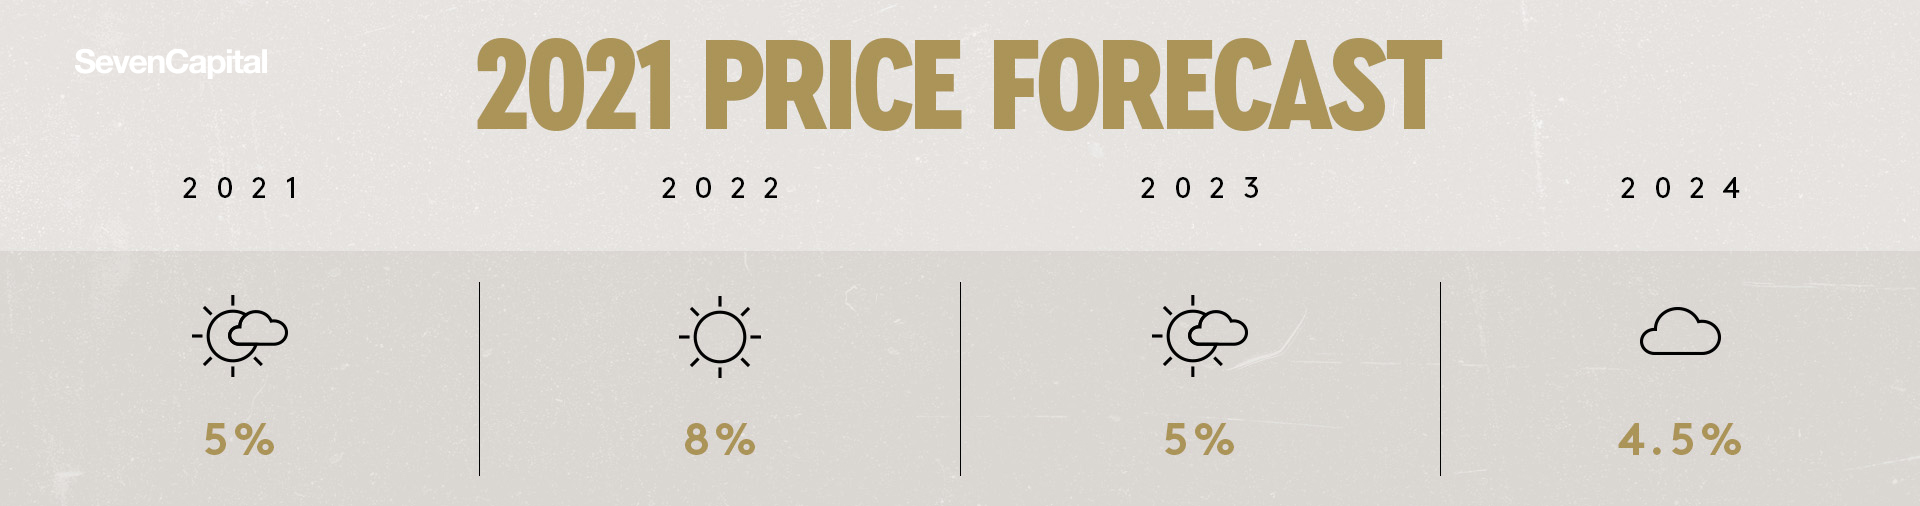 Price Forecast 2021